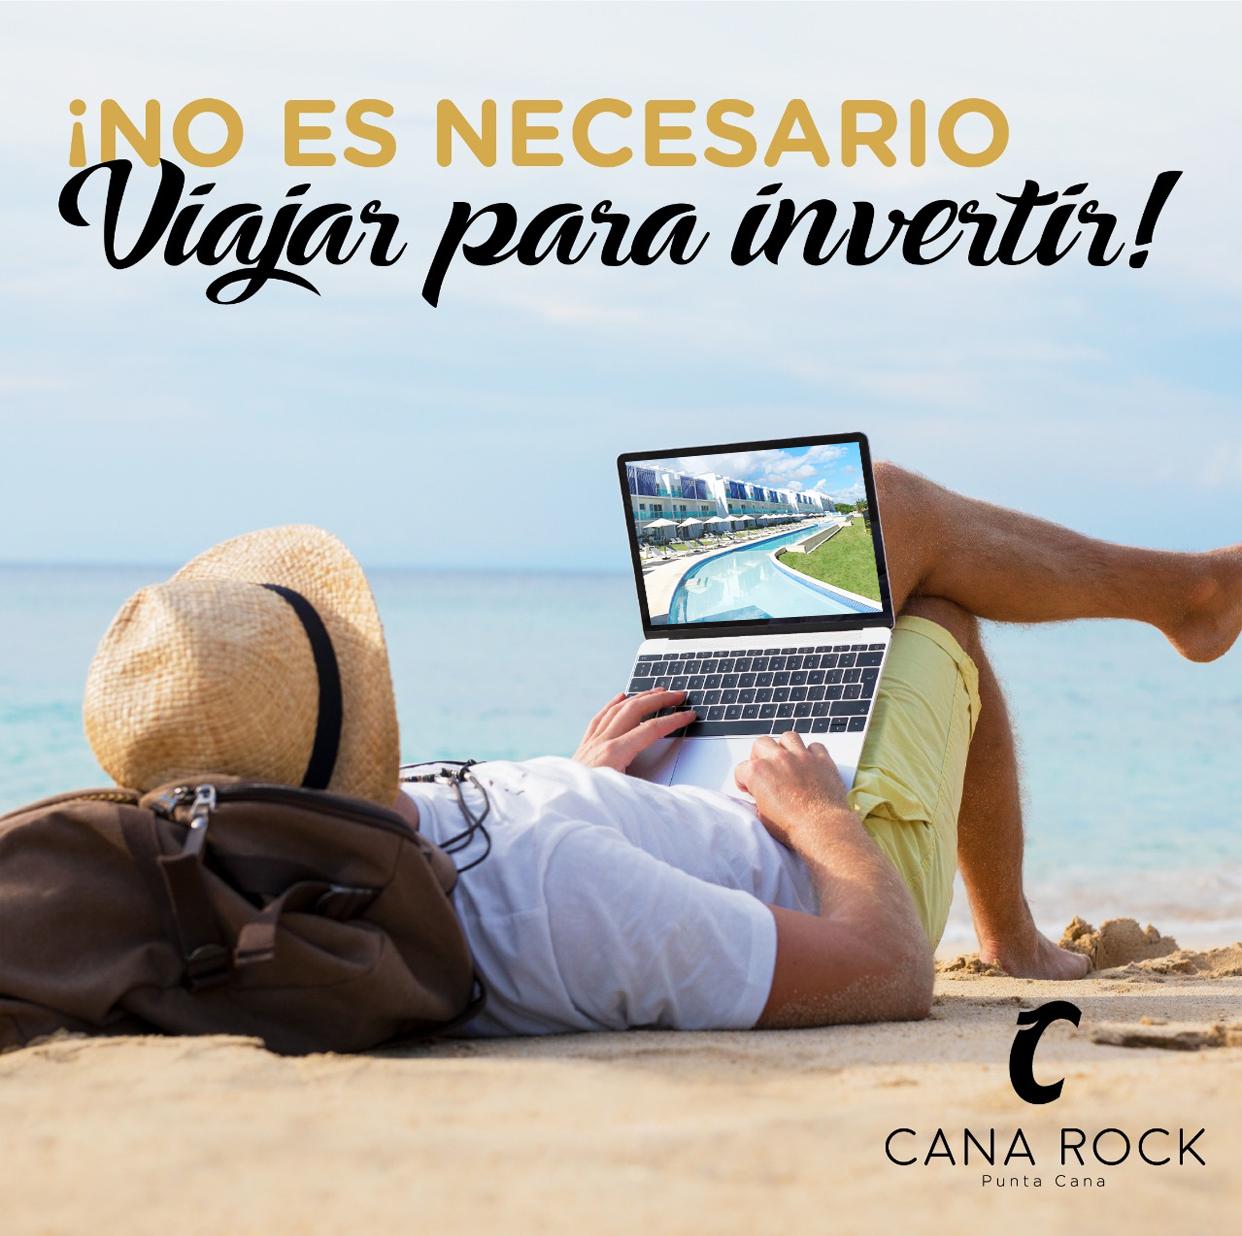 Cana Rock para inversionista inteligente